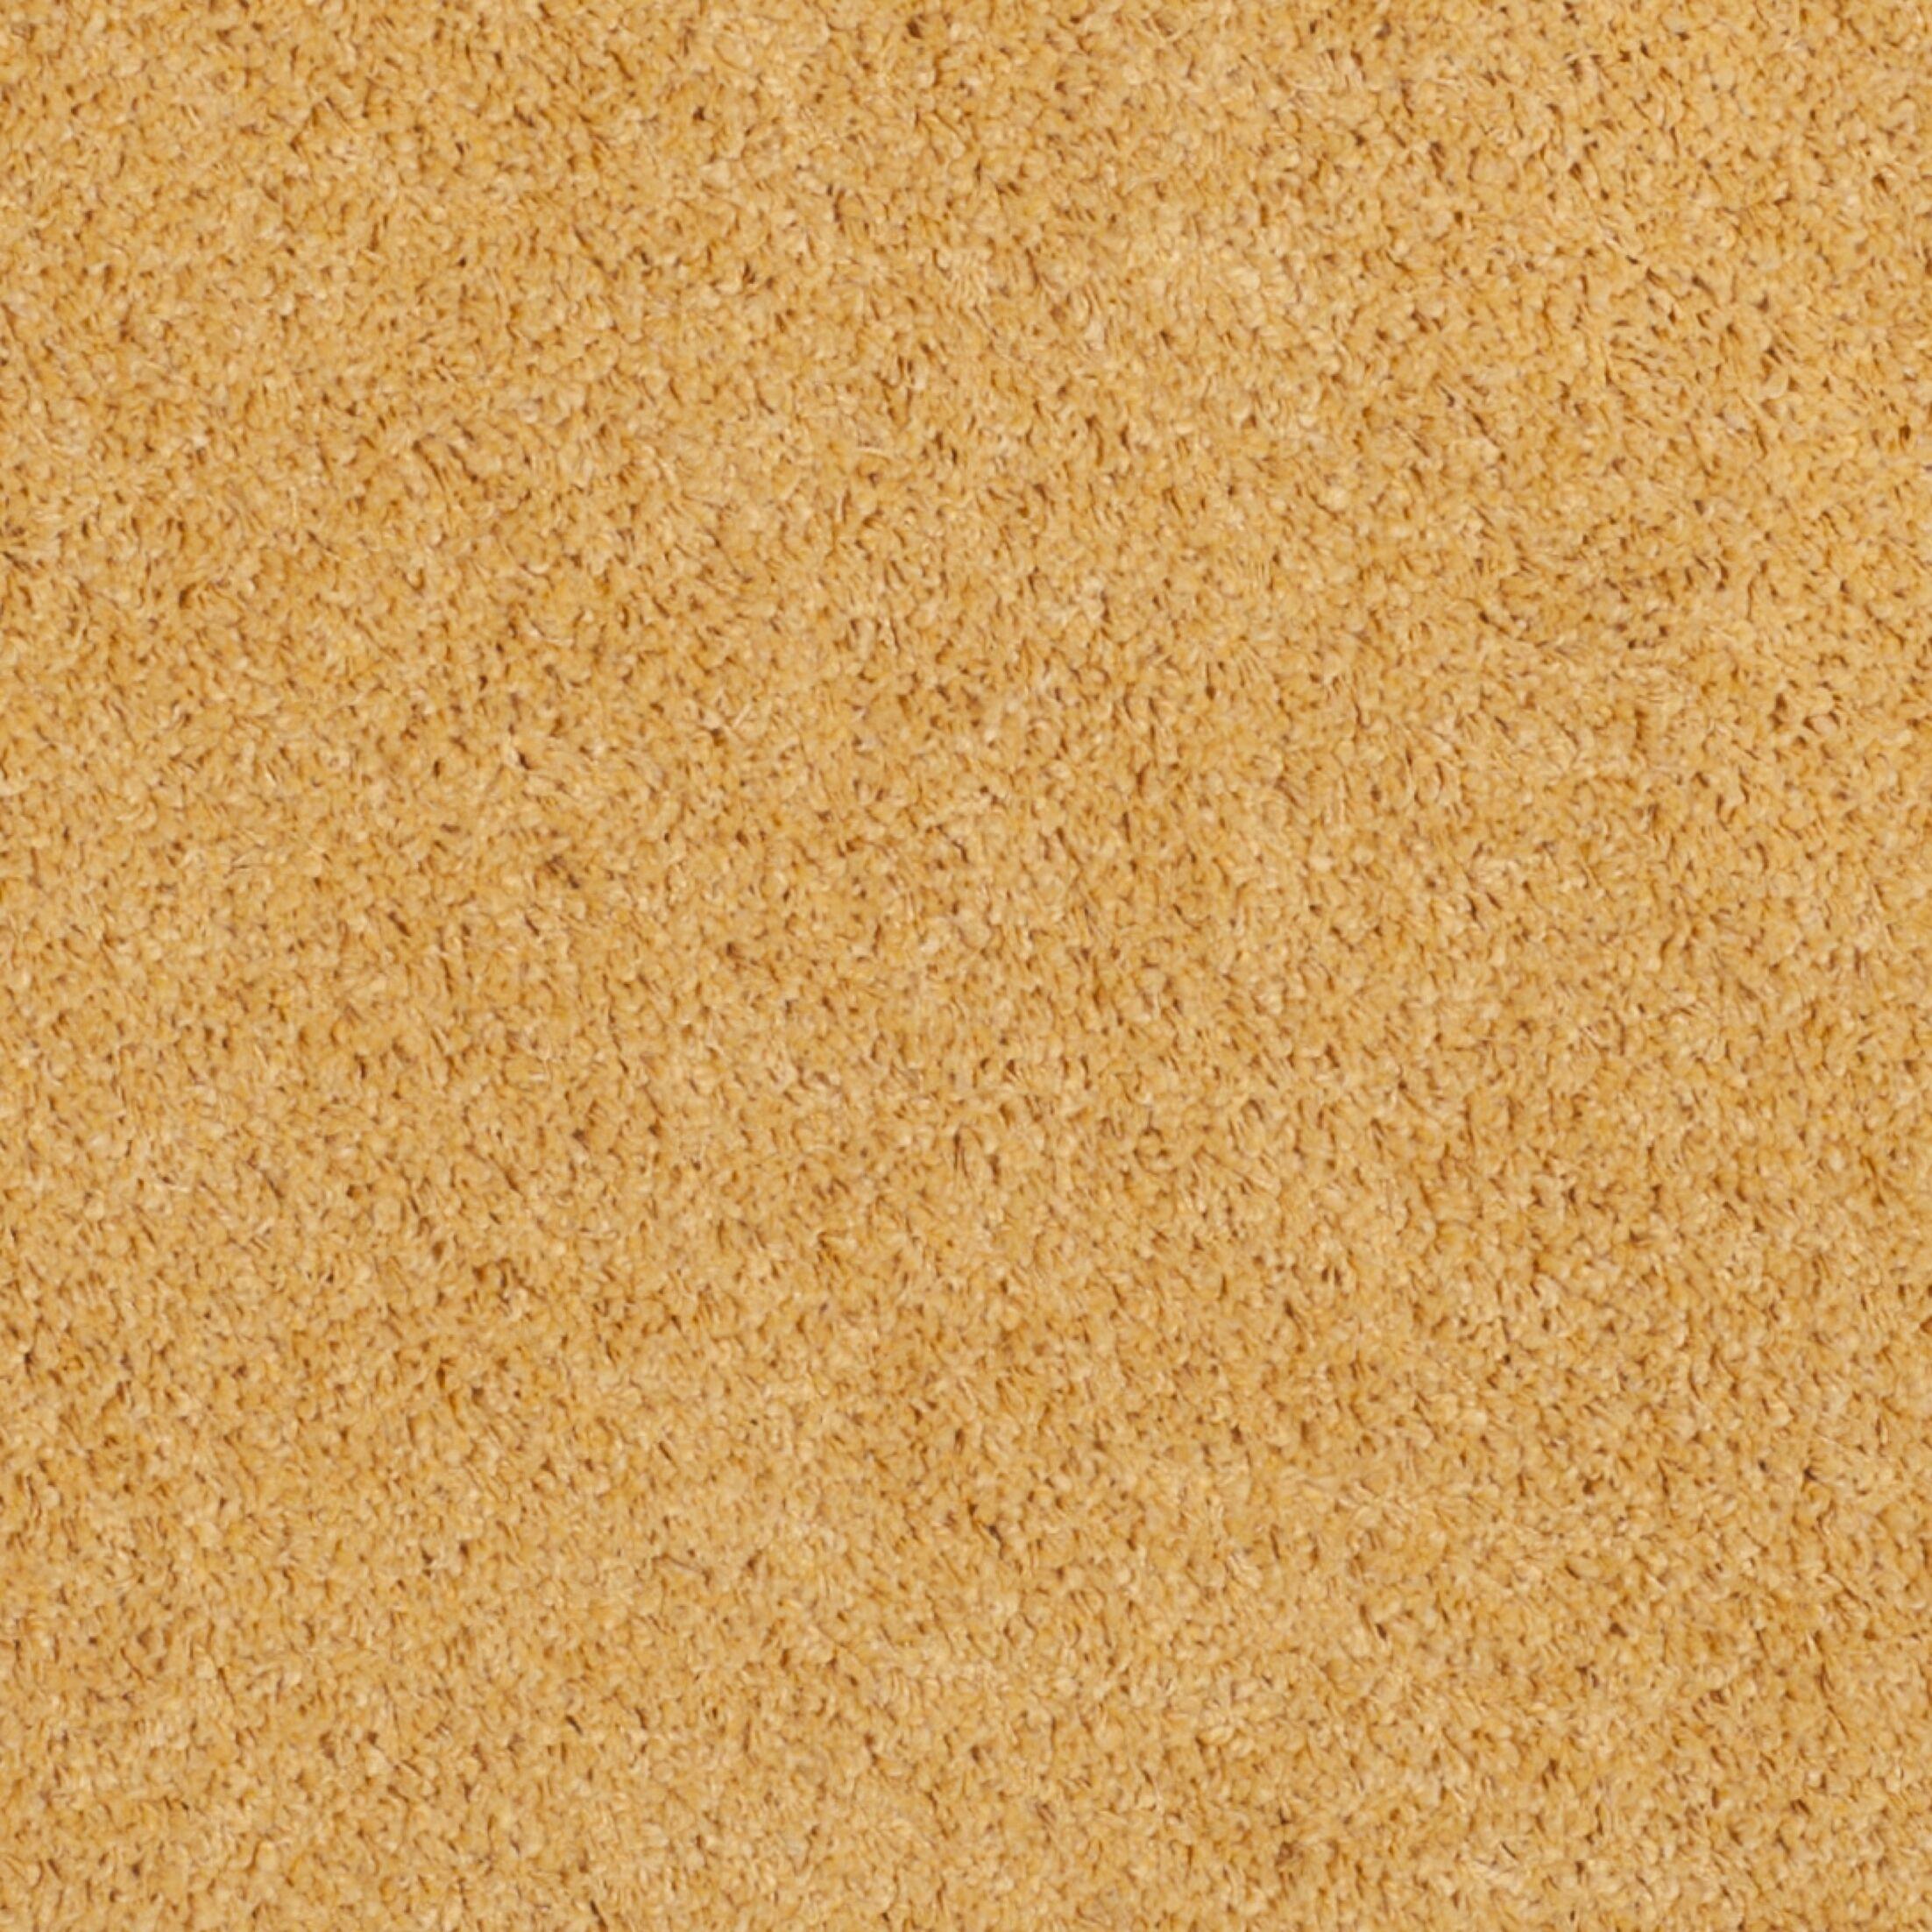 Curran Shag Gold Area Rug Rug Size: Rectangle 8' x 10'